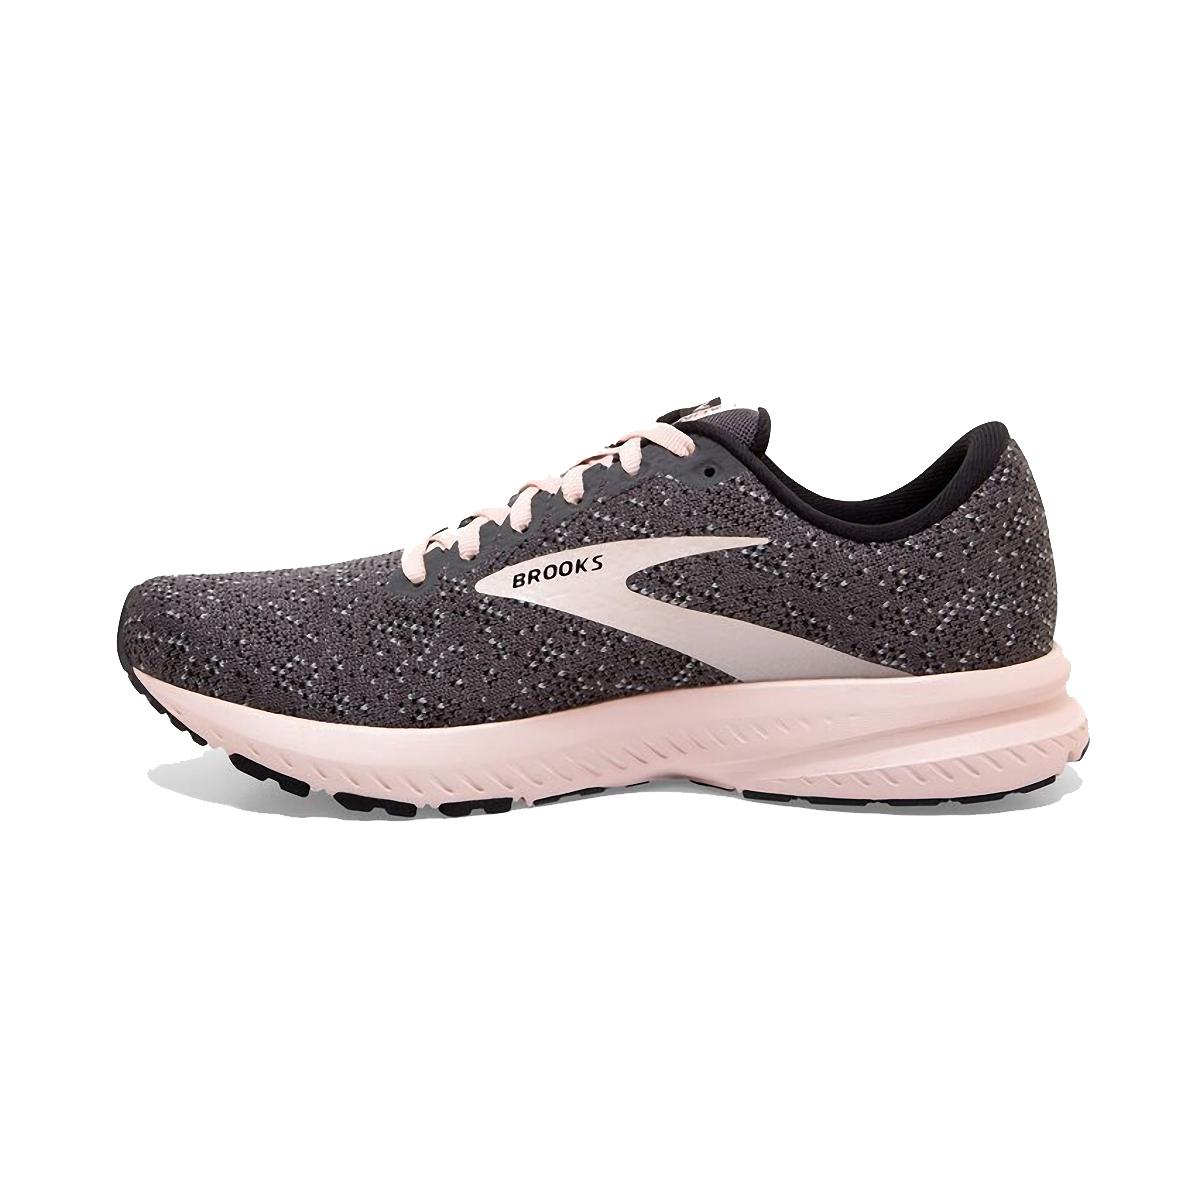 Women's Brooks Launch 7 Running Shoe - Color: Black/Pearl/Pink - Size: 5 - Width: Regular, Black/Pearl/Pink, large, image 2